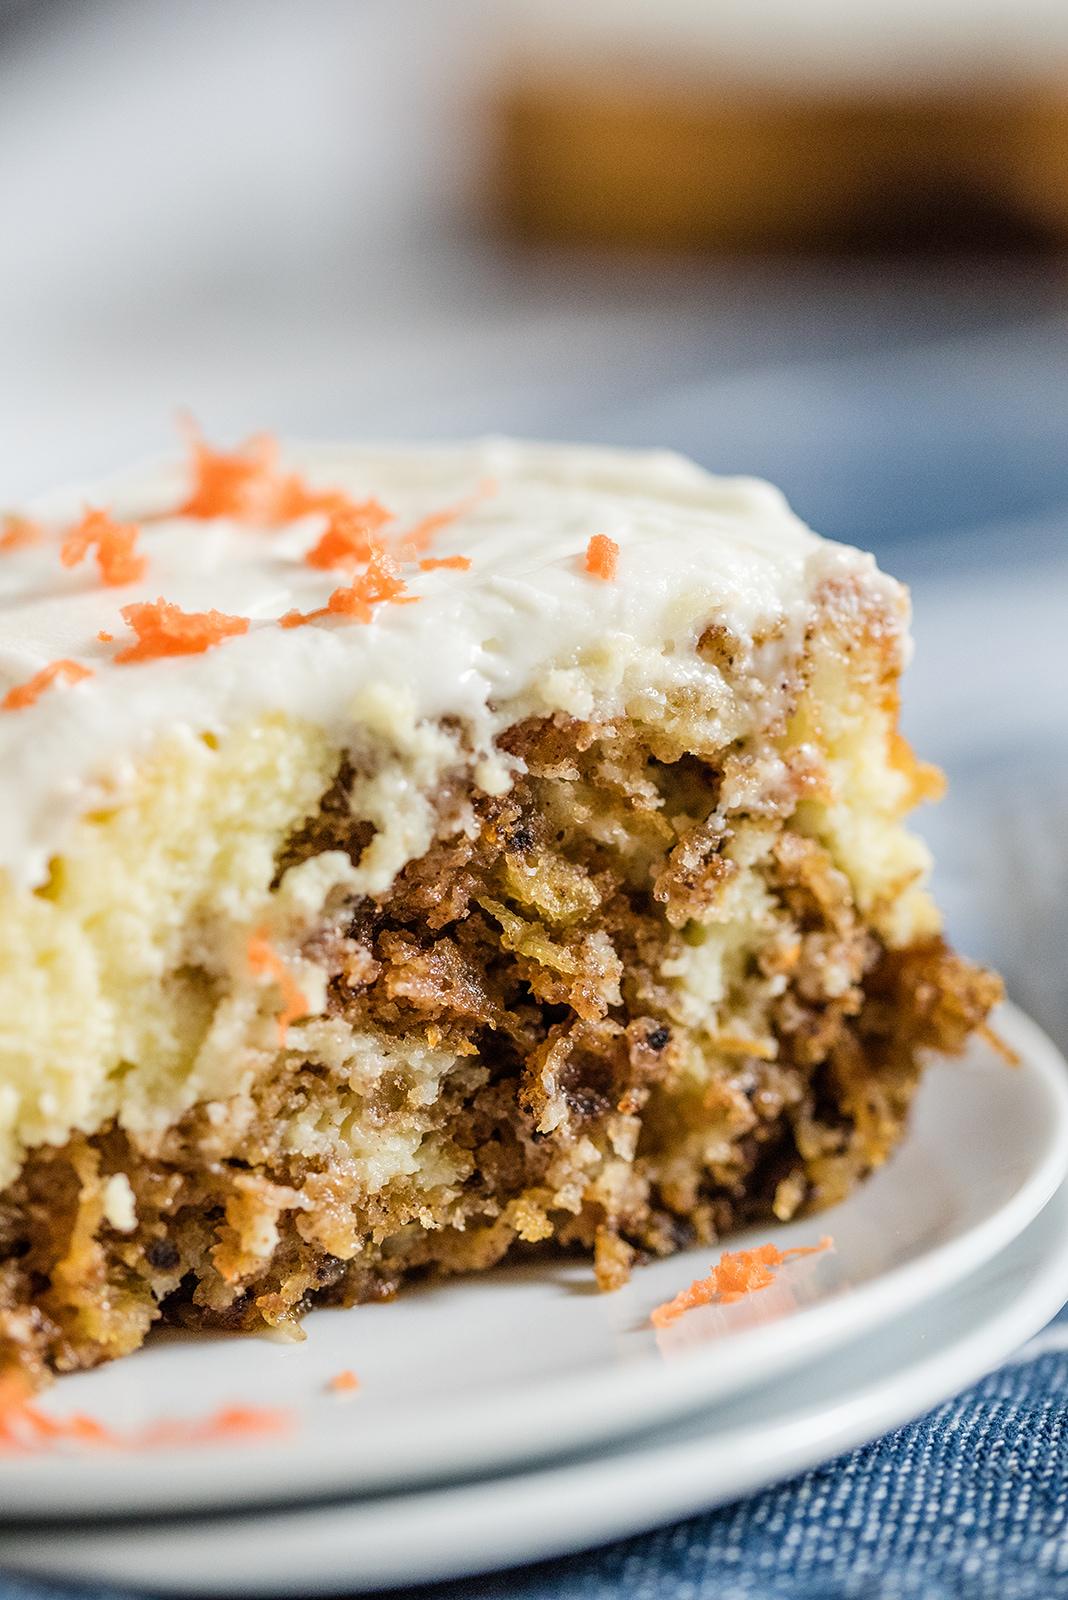 Carrot Cake Cheesecake Bunny S Warm Oven